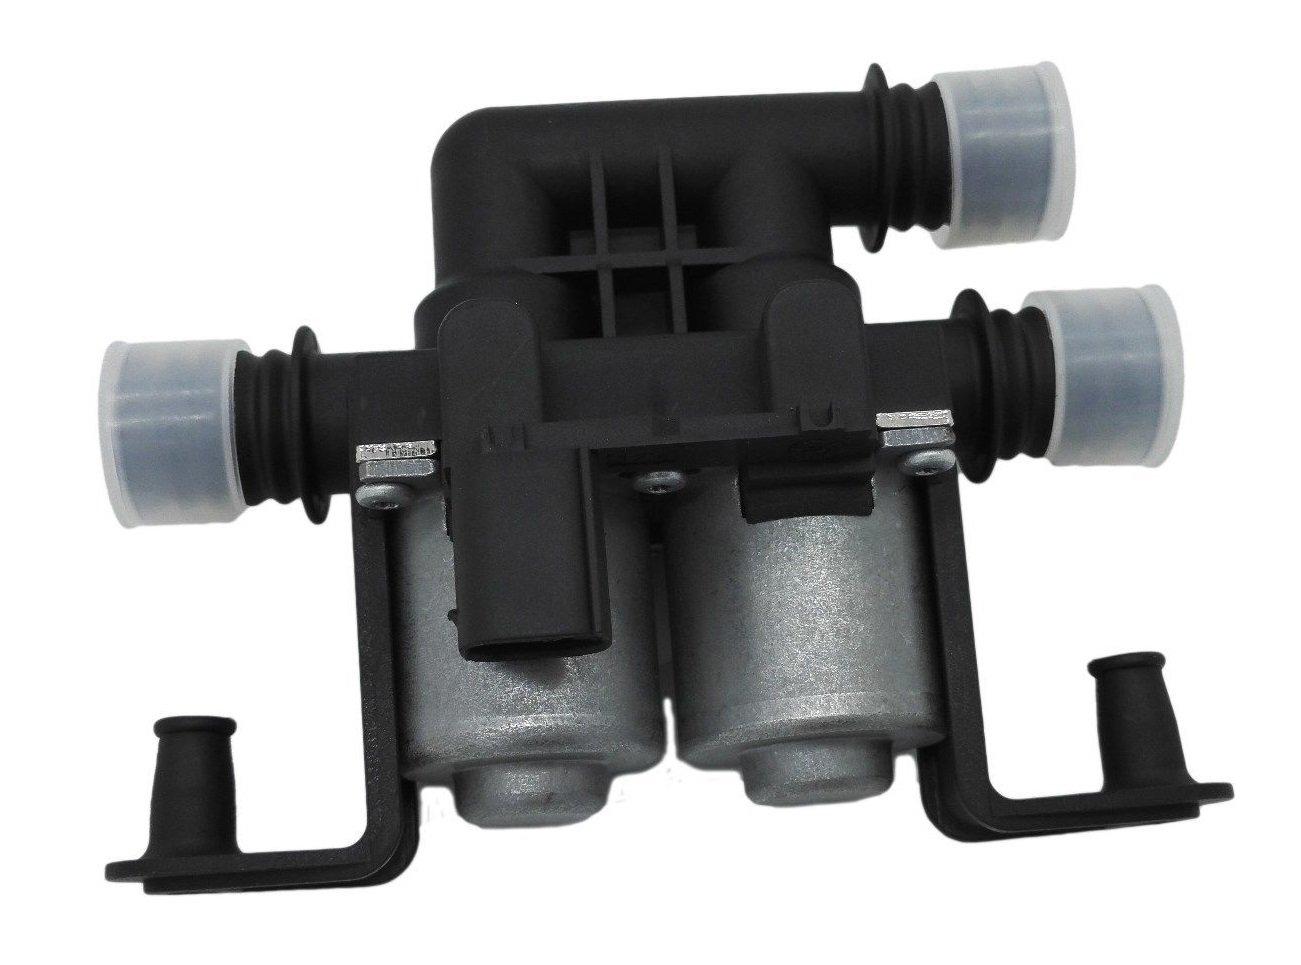 Okay Motor Heater Control Valve Dual Solenoid For 03 12 Land Rover Engine Belt Diagram 4 Range Jqd000010 Automotive